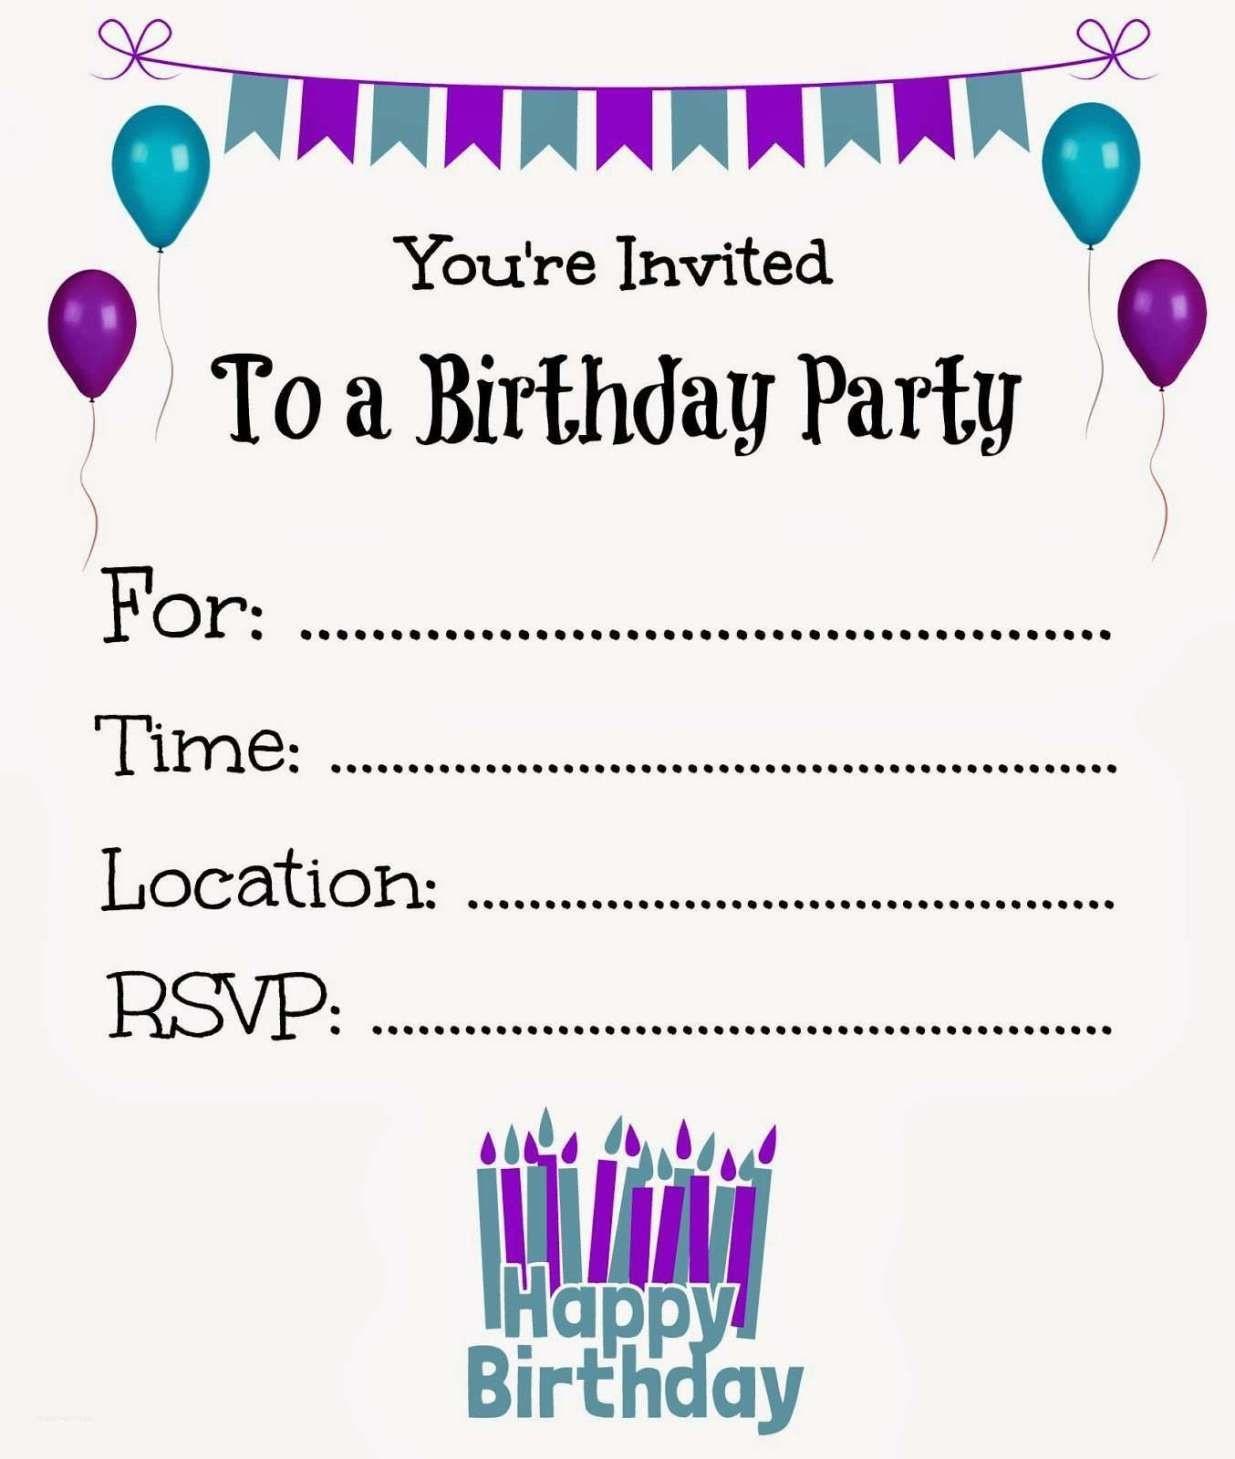 New Free Online Printable Birthday Party Invitations | Online - Make Printable Party Invitations Online Free